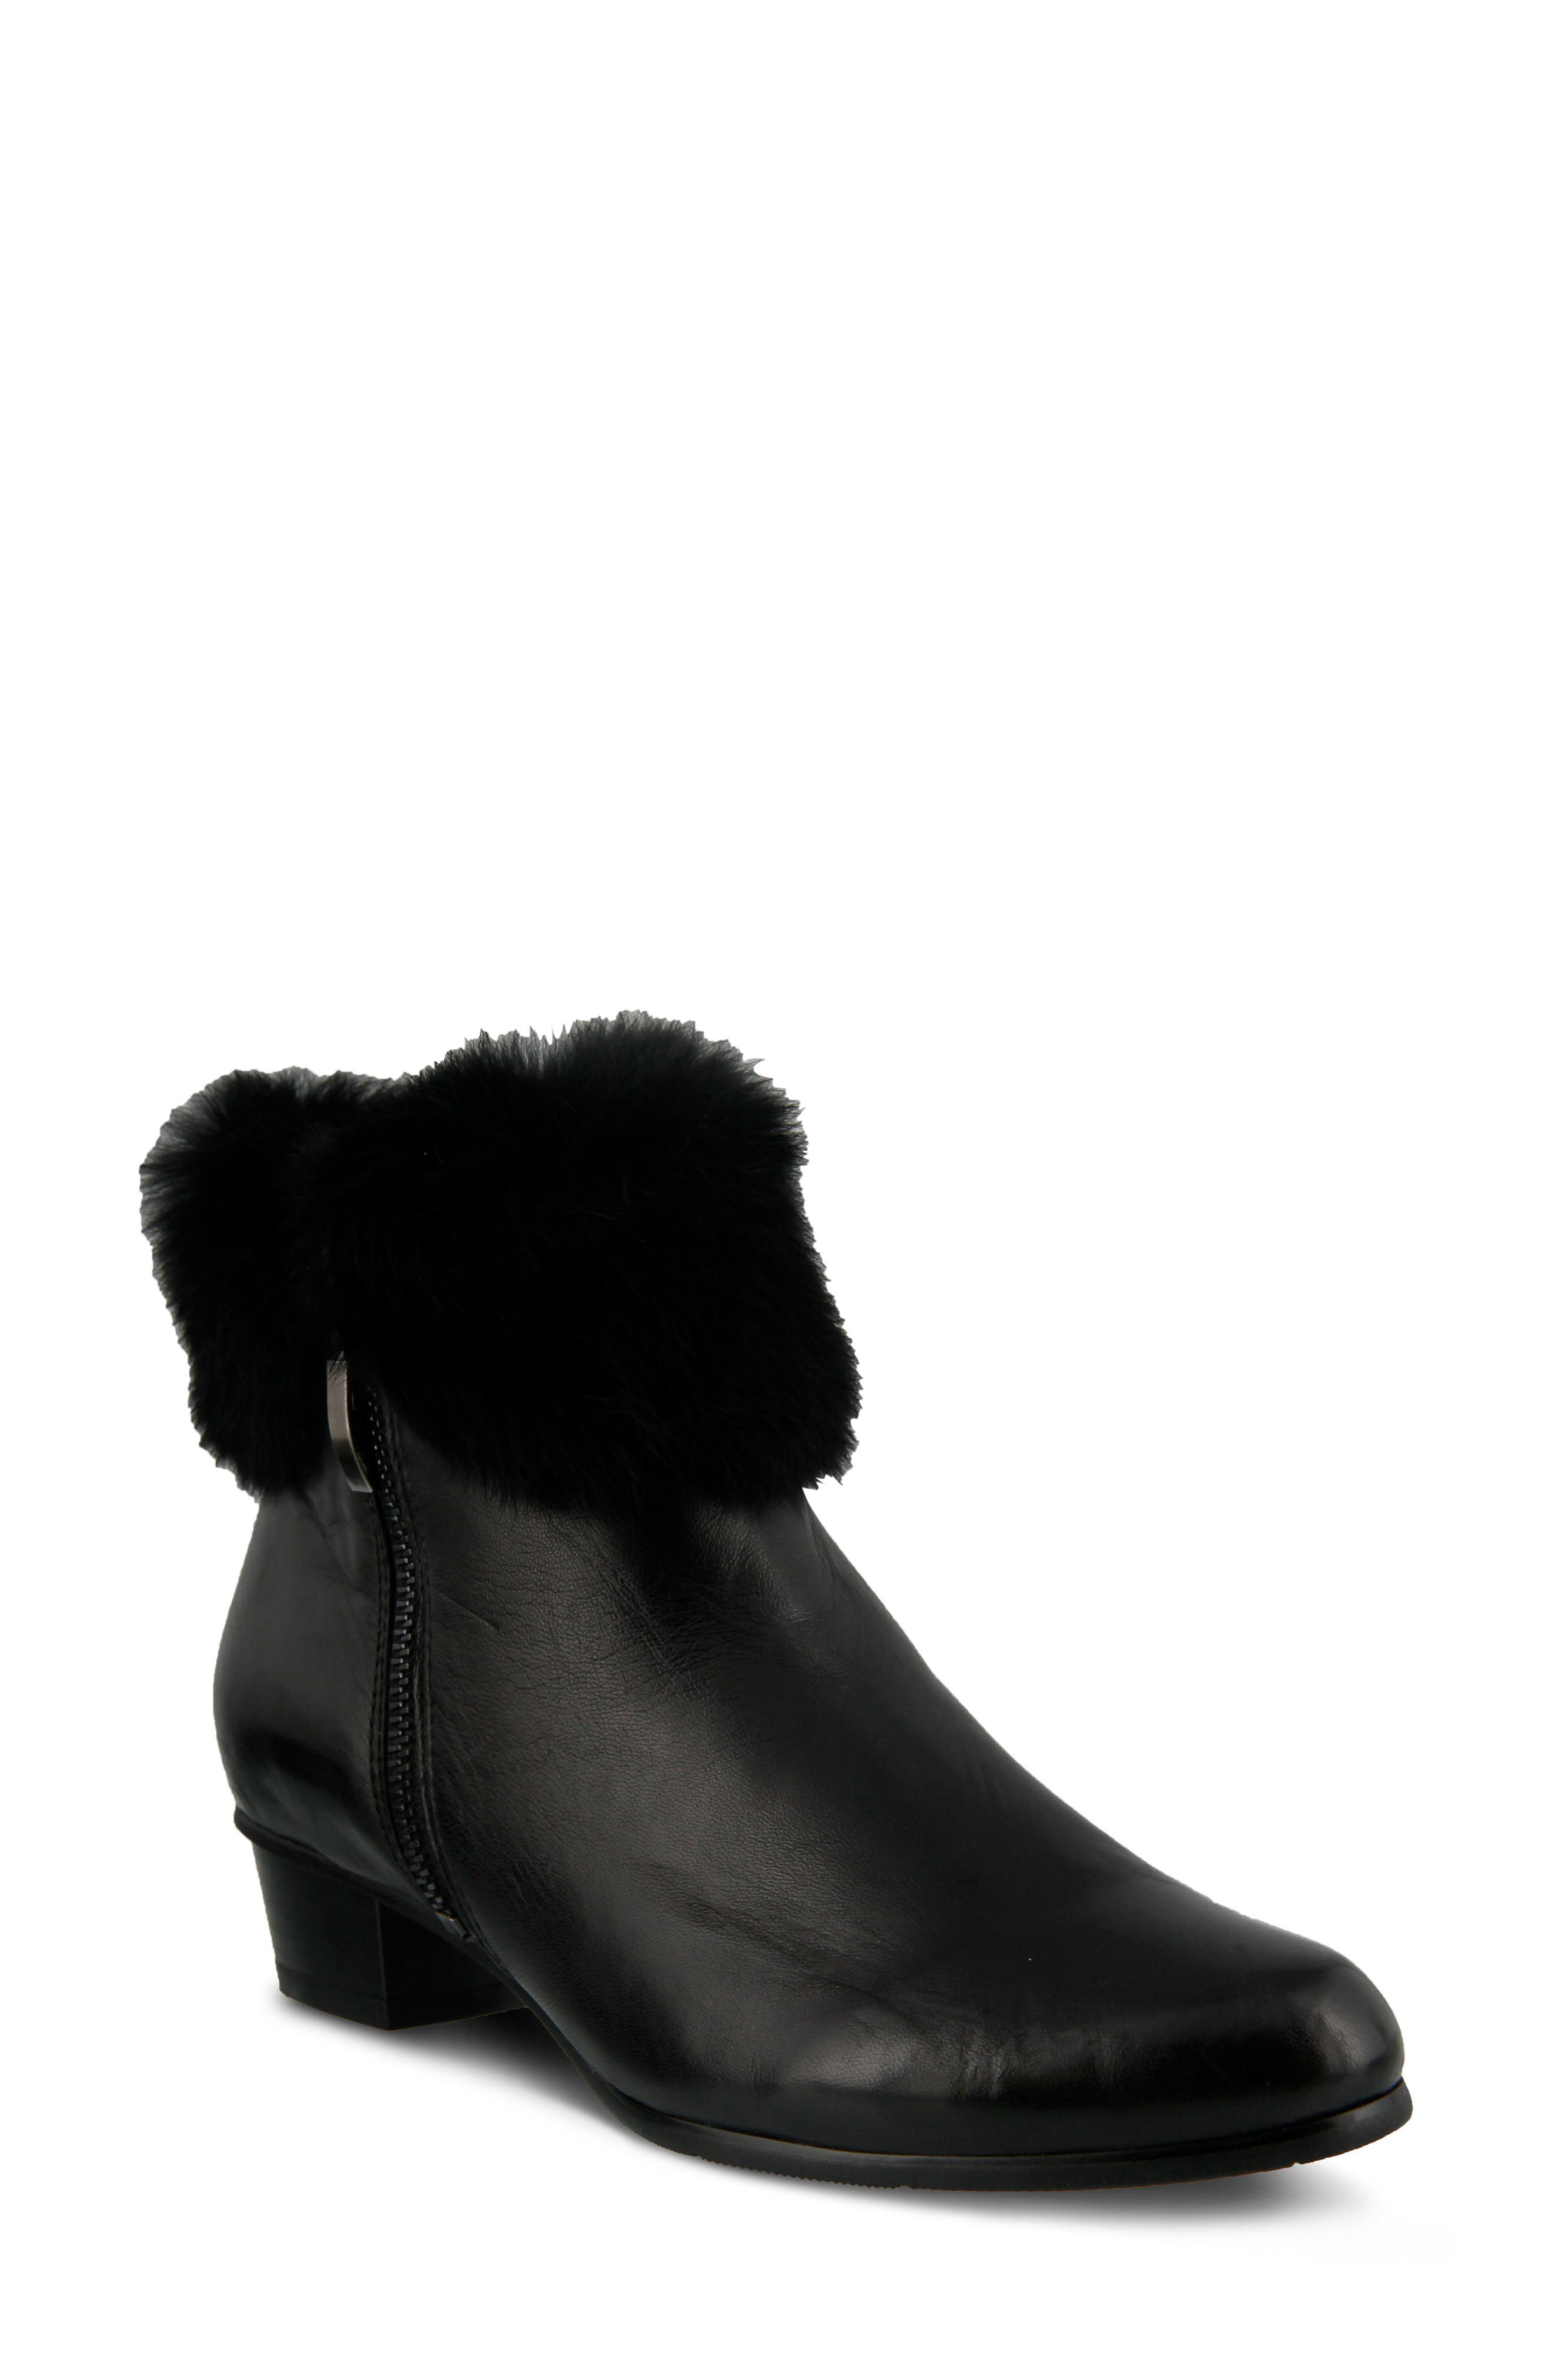 Spring Step Women's Burnside Faux Fur Trim Bootie